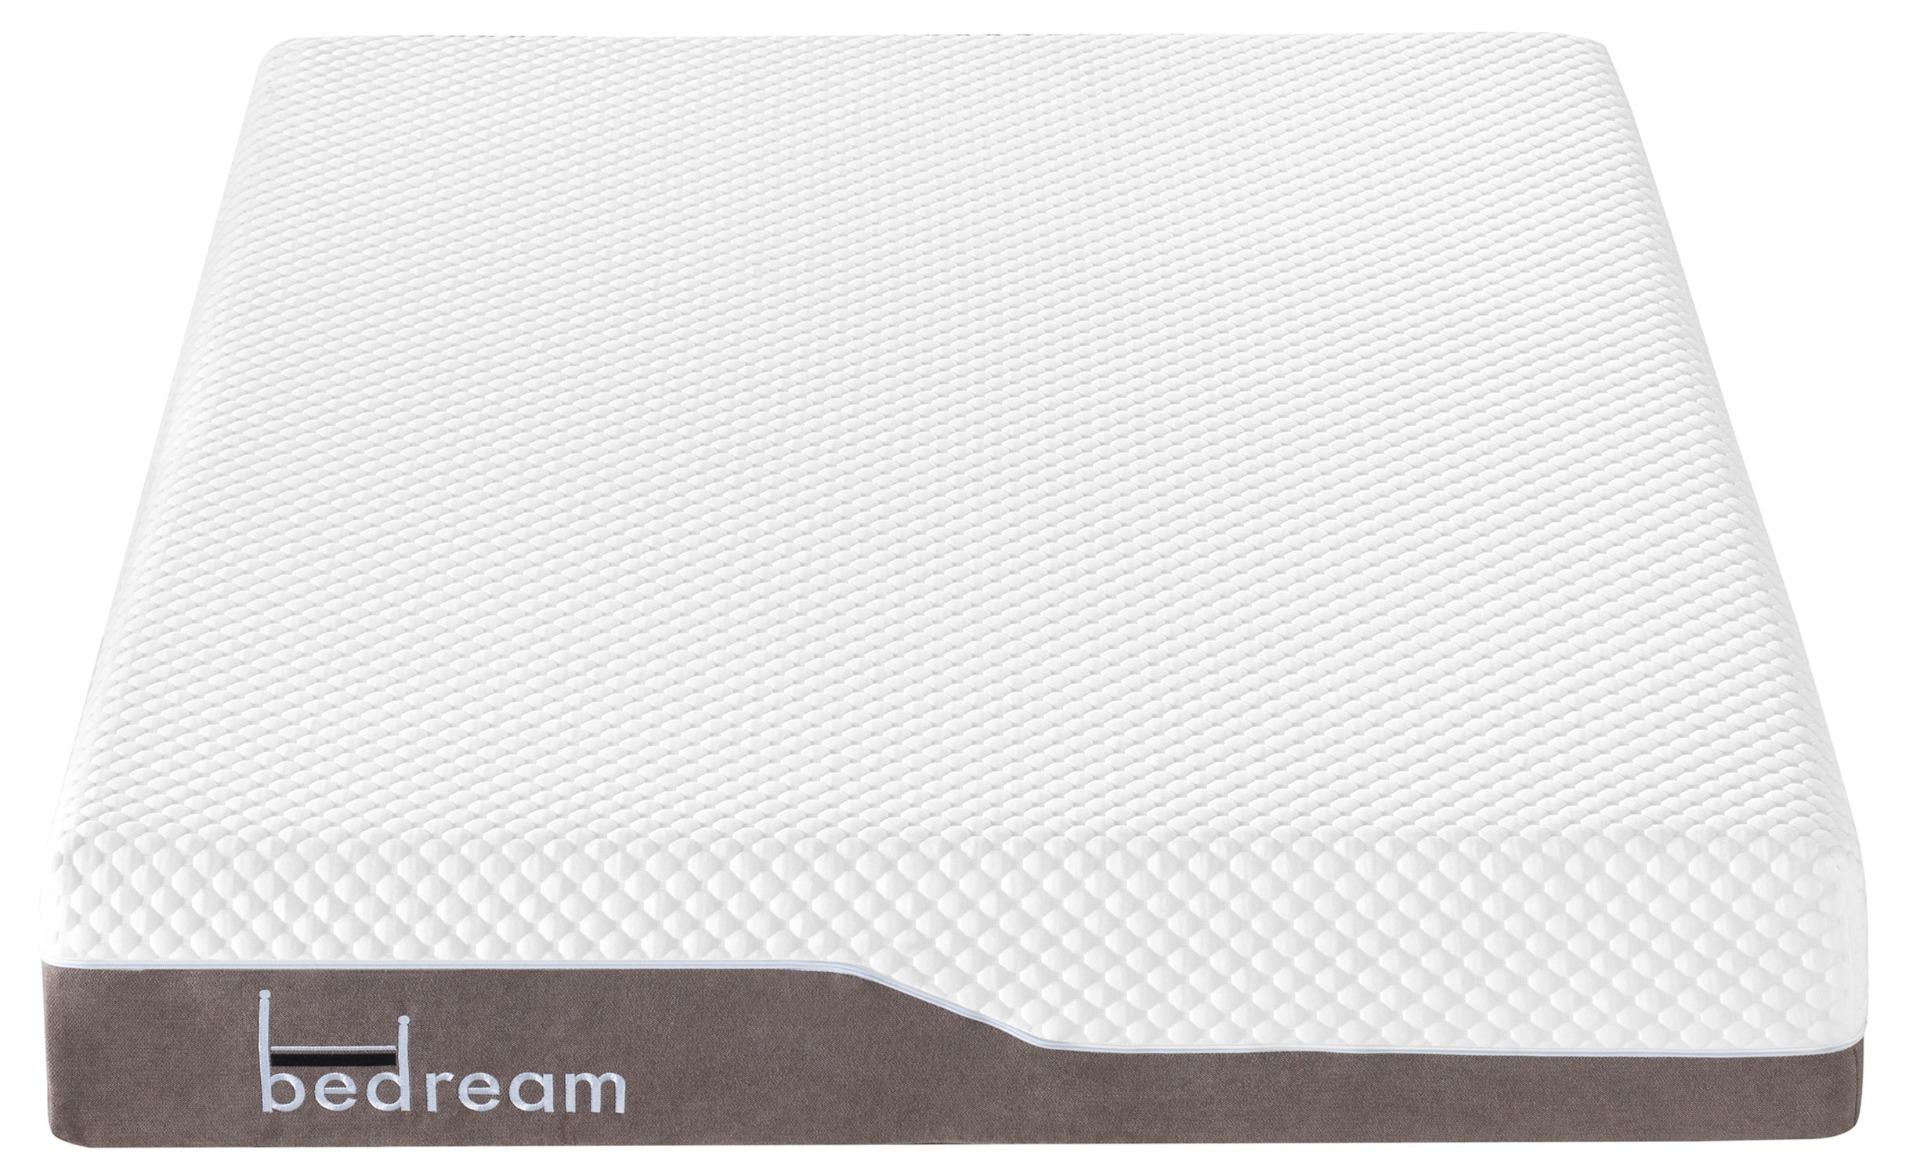 Materasso in memory foam Bedream Premium 180x200cm